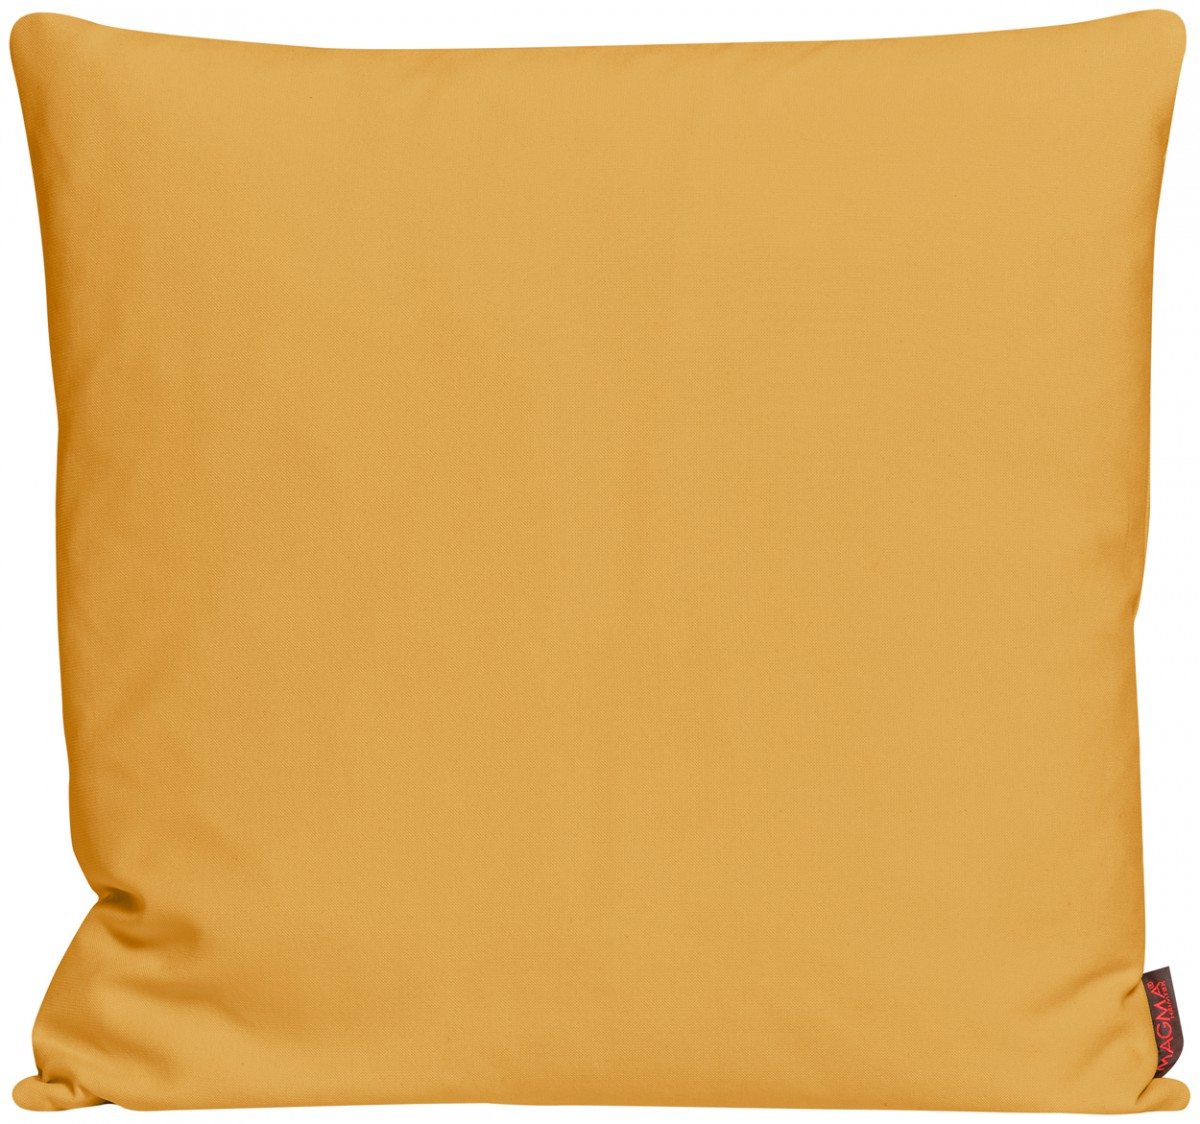 kissenh lle kissen paso 50x50cm goldfarben gelb wohntextilien kissen klassisch uni. Black Bedroom Furniture Sets. Home Design Ideas